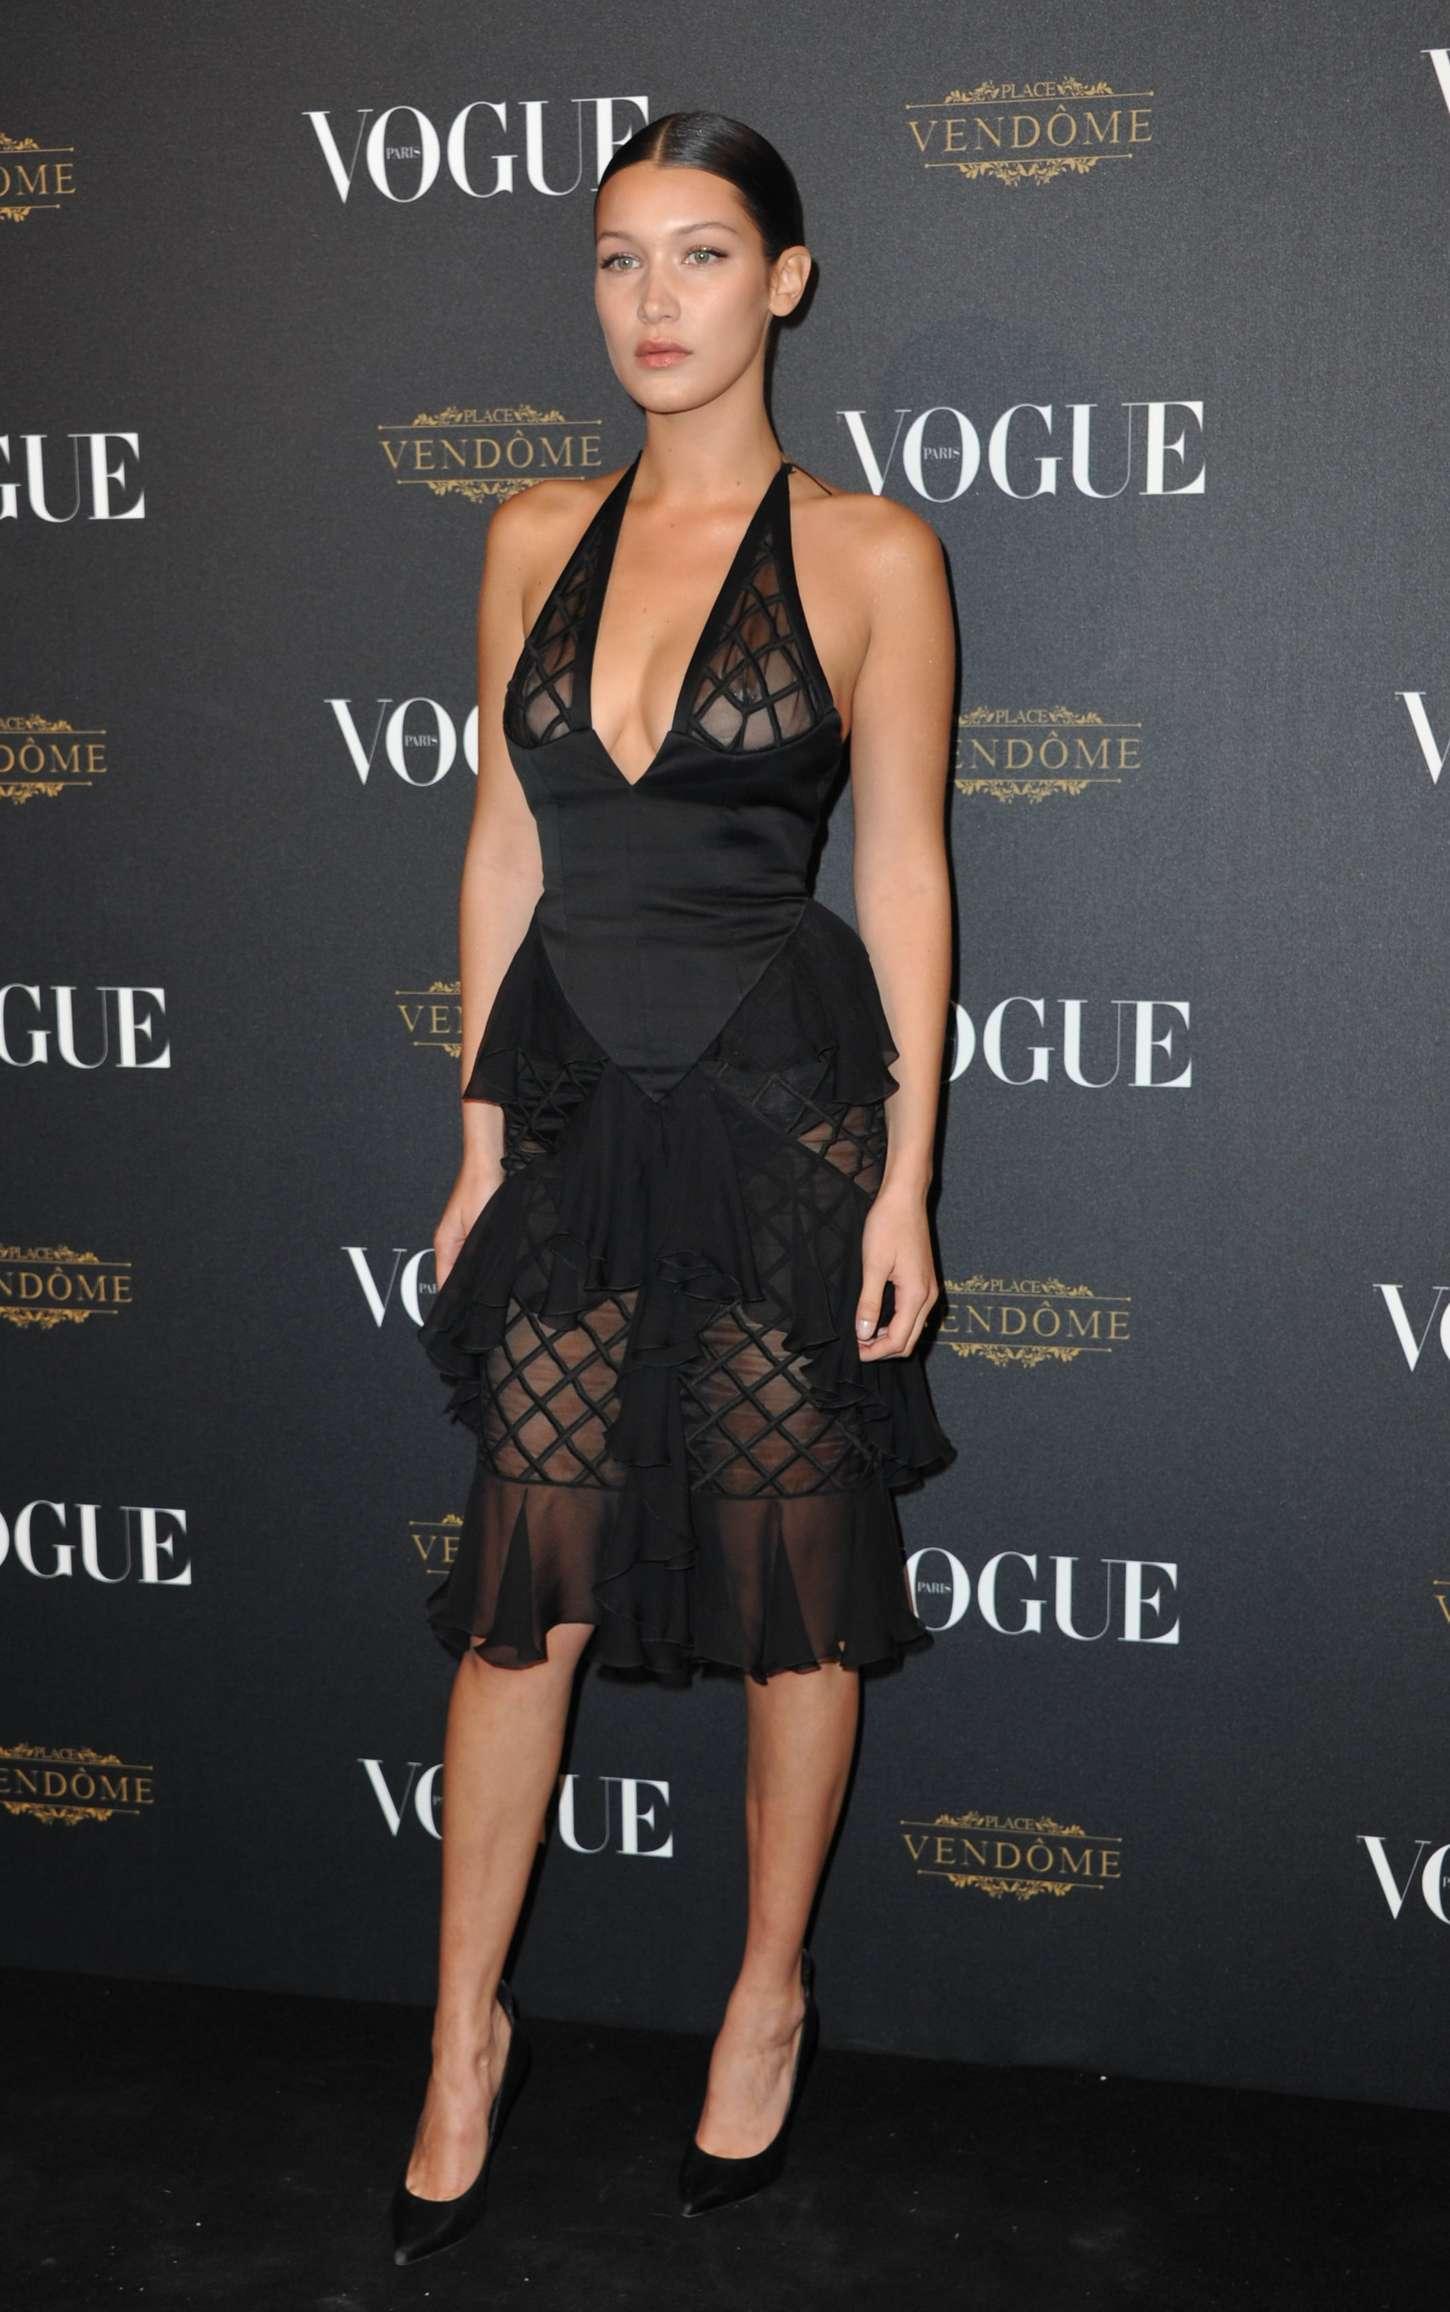 Bella Hadid Vogue 95th Anniversary Party 03 Gotceleb